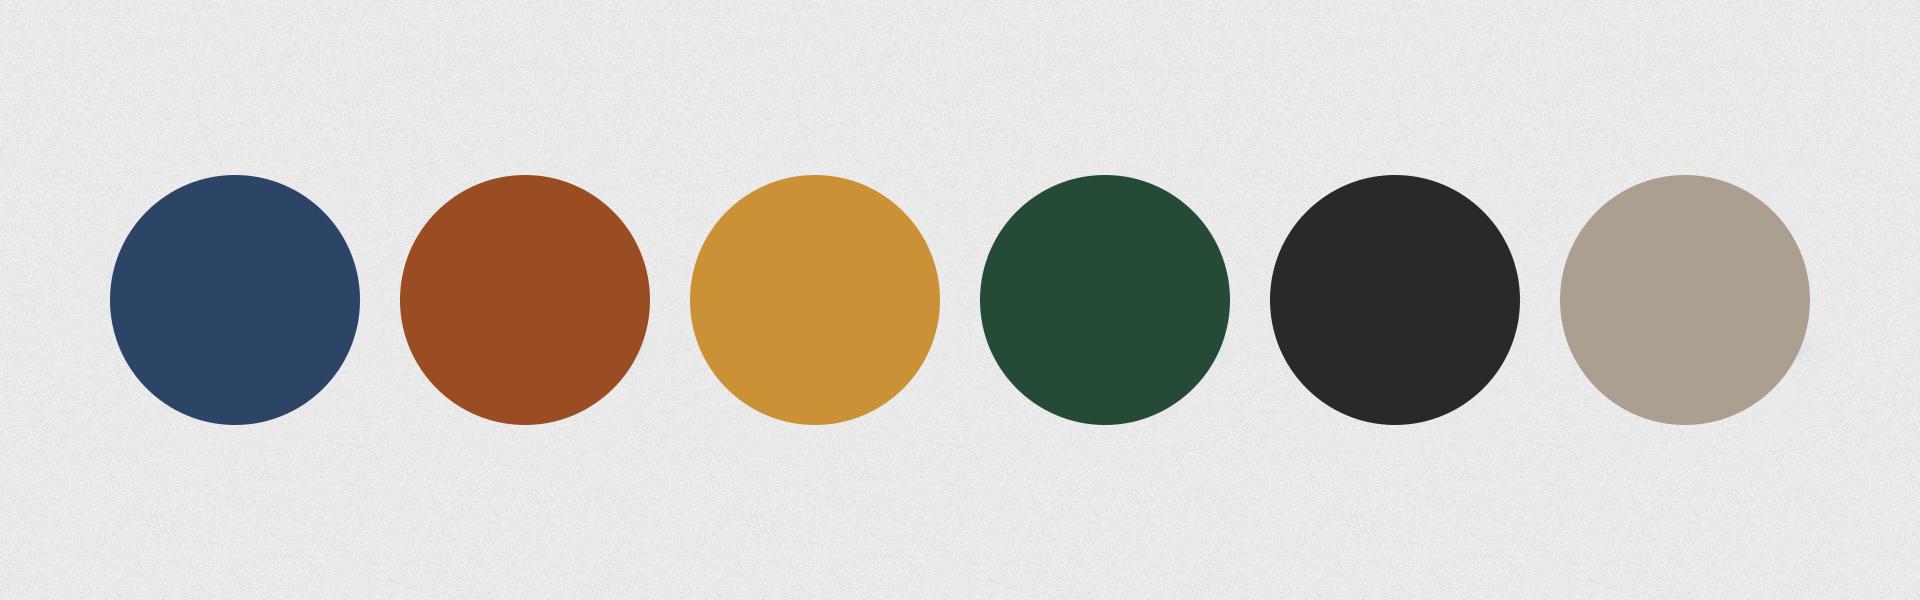 polaroid-onestep-plus-palette